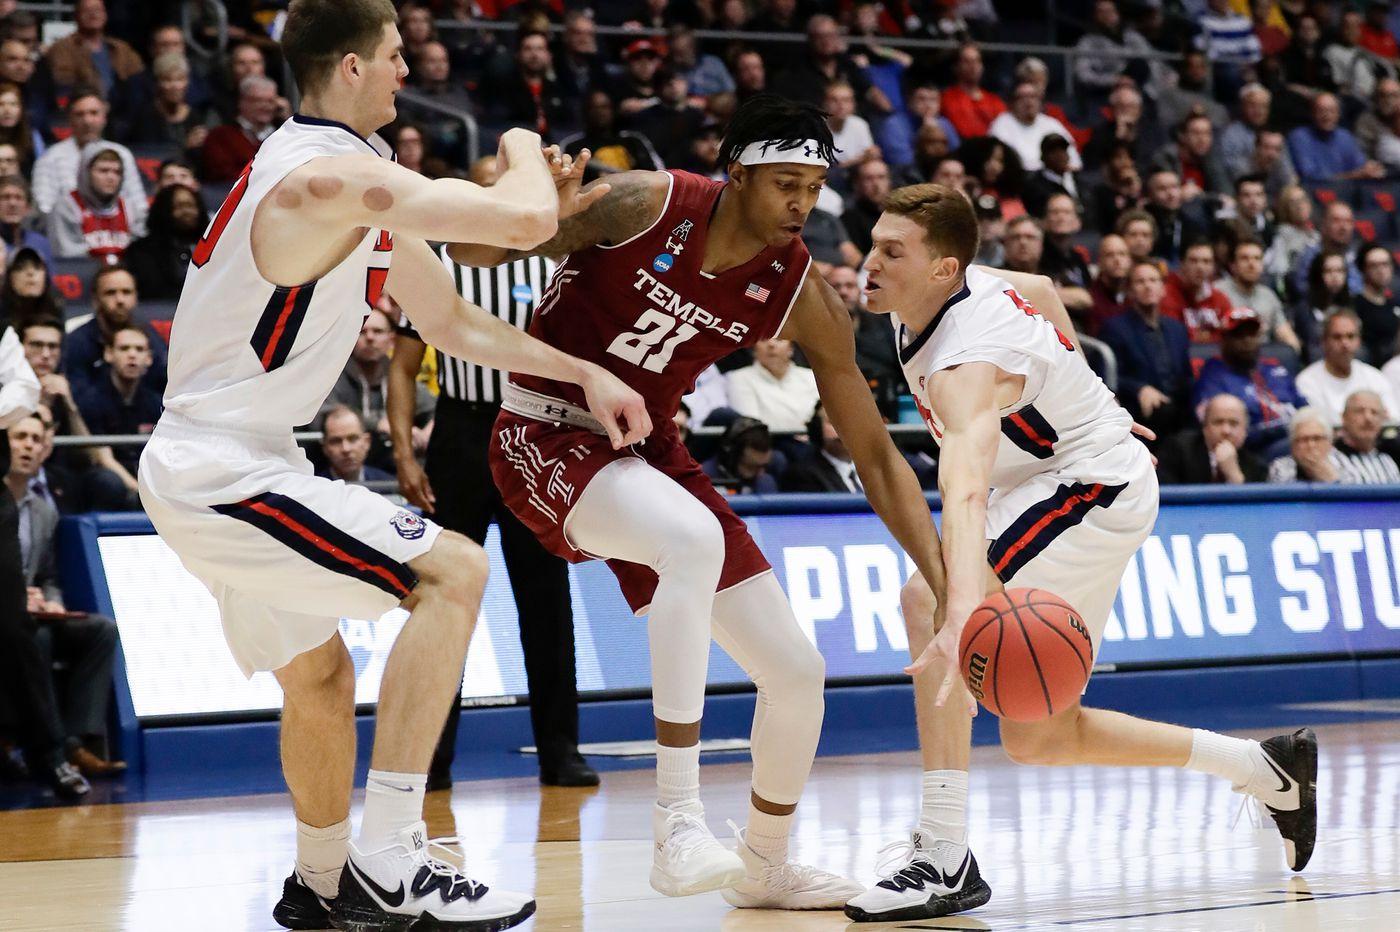 A more versatile Belmont team ended Temple's NCAA Tournament hopes